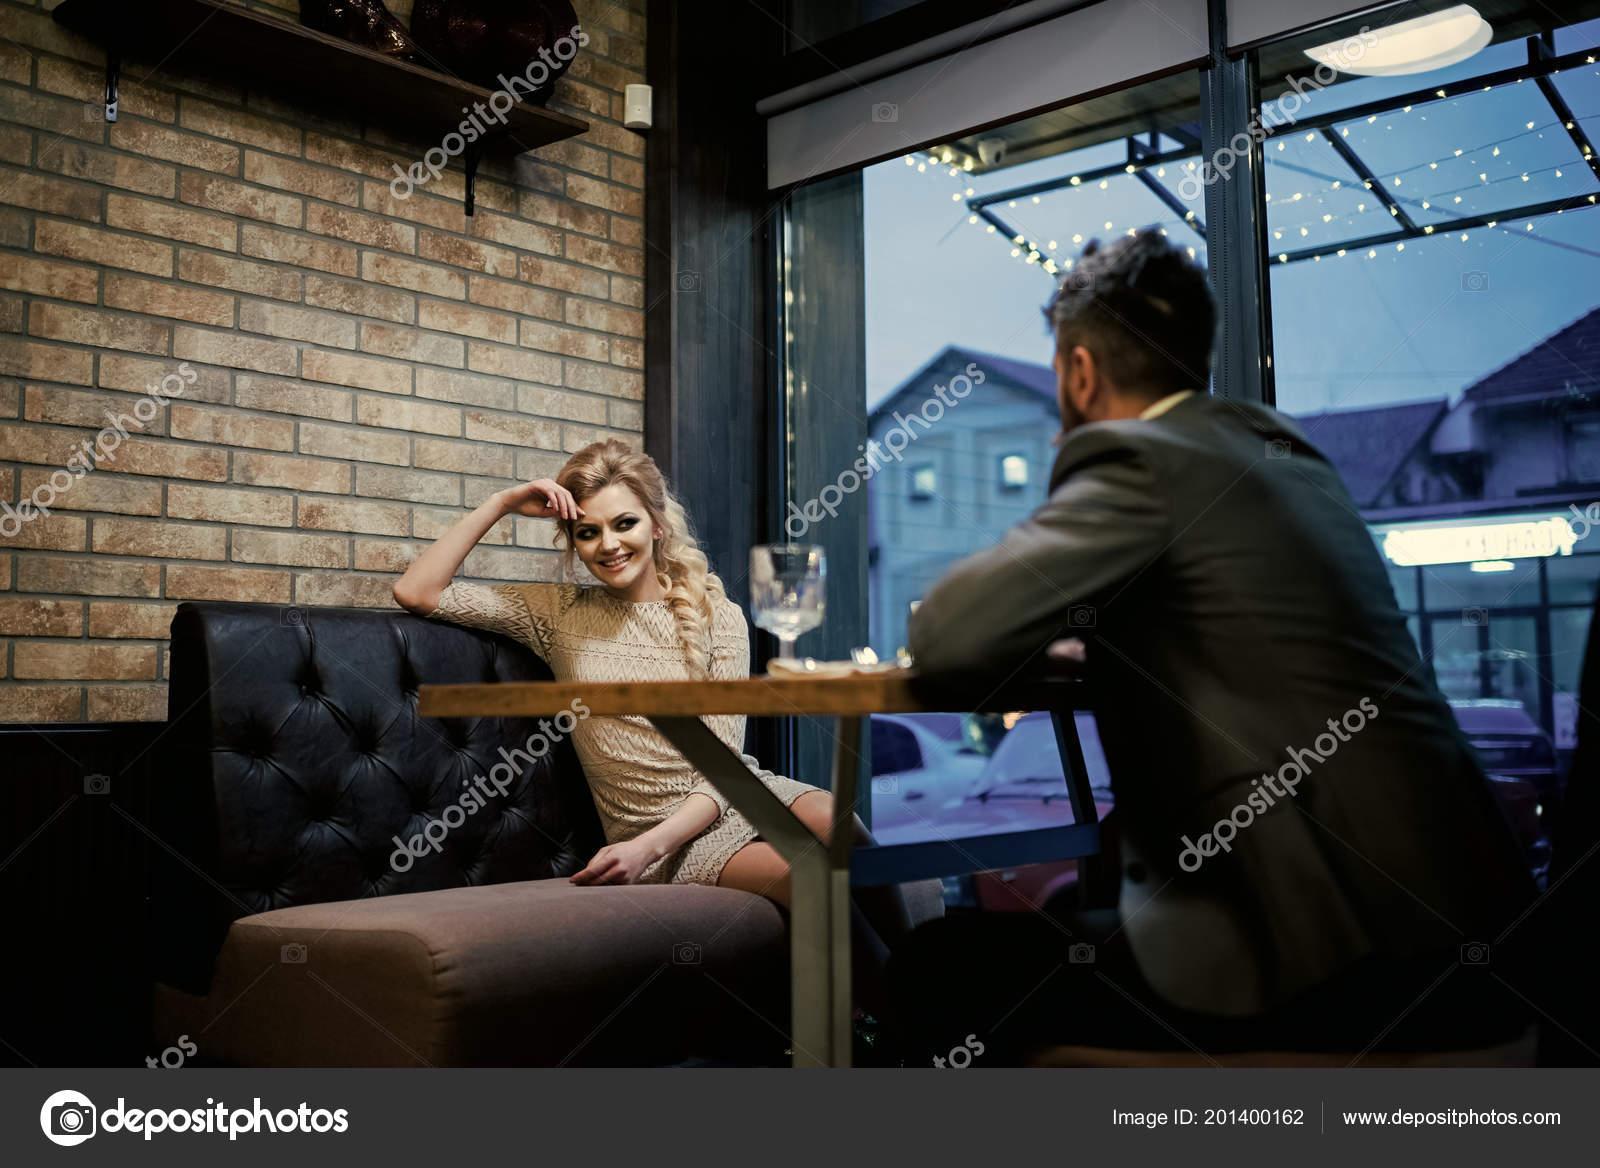 Dating σε απευθείας σύνδεση αίθουσες συνομιλίας